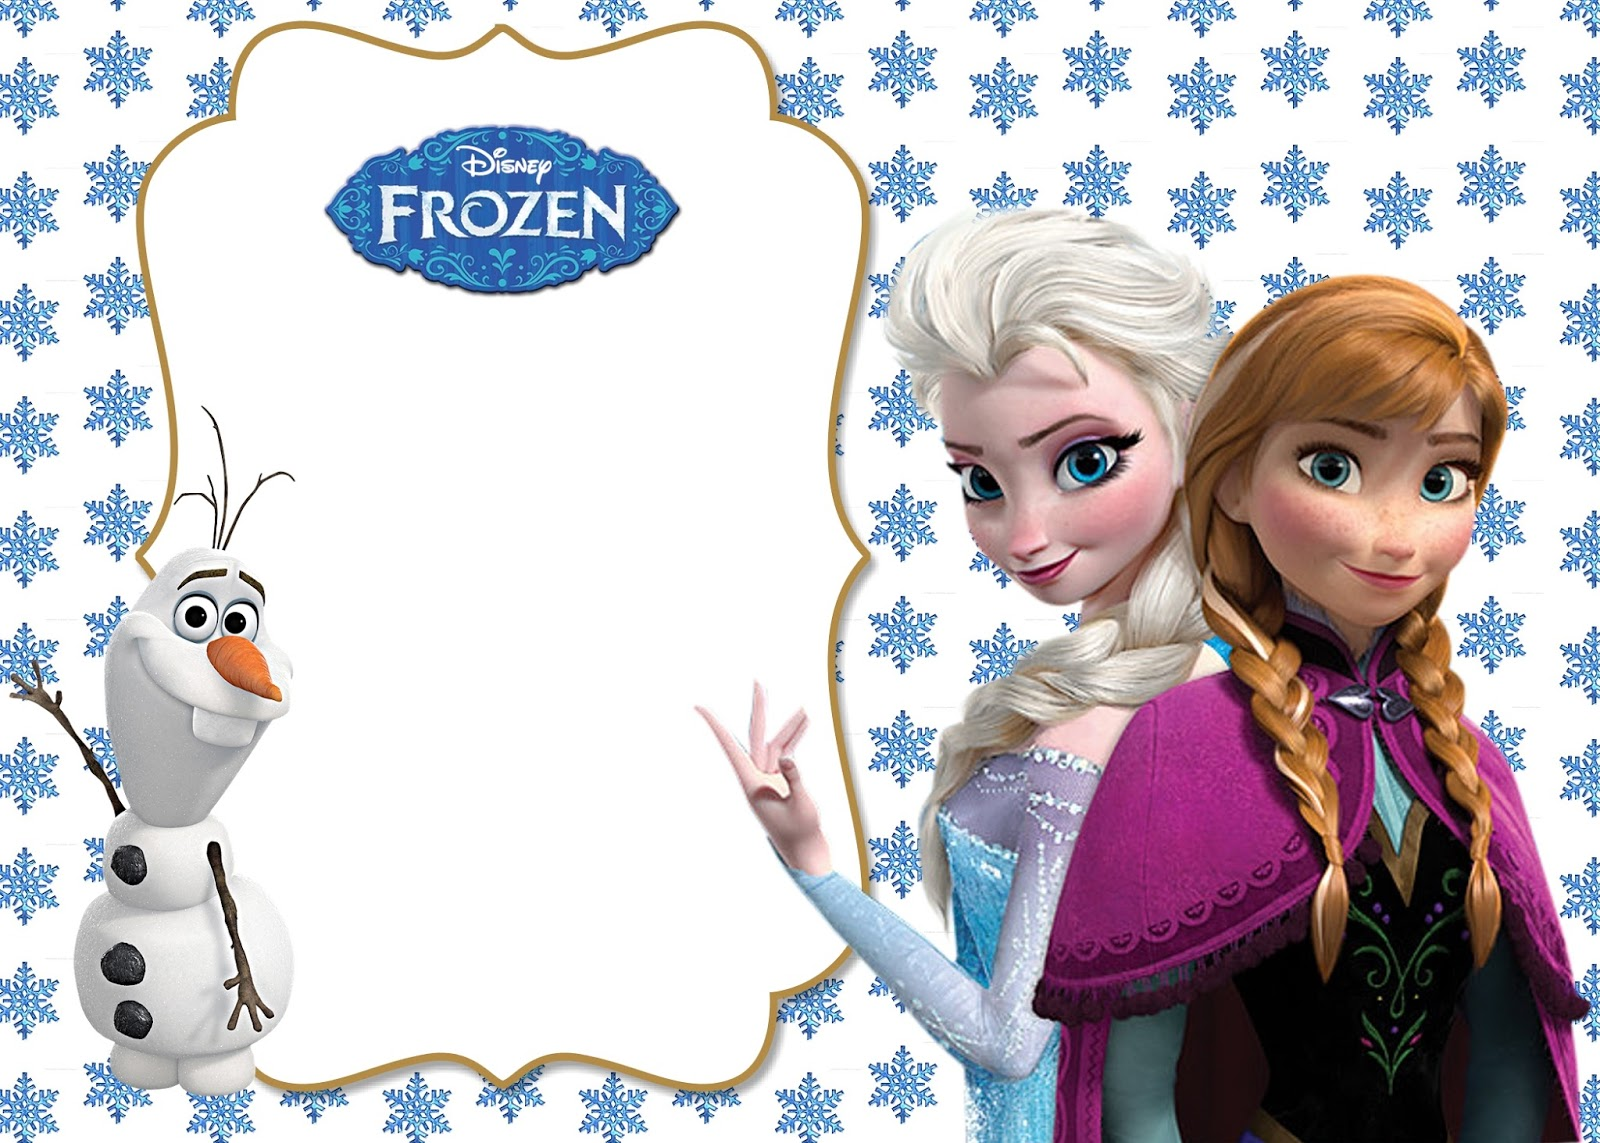 Frozen Birthday Invite was luxury invitations sample